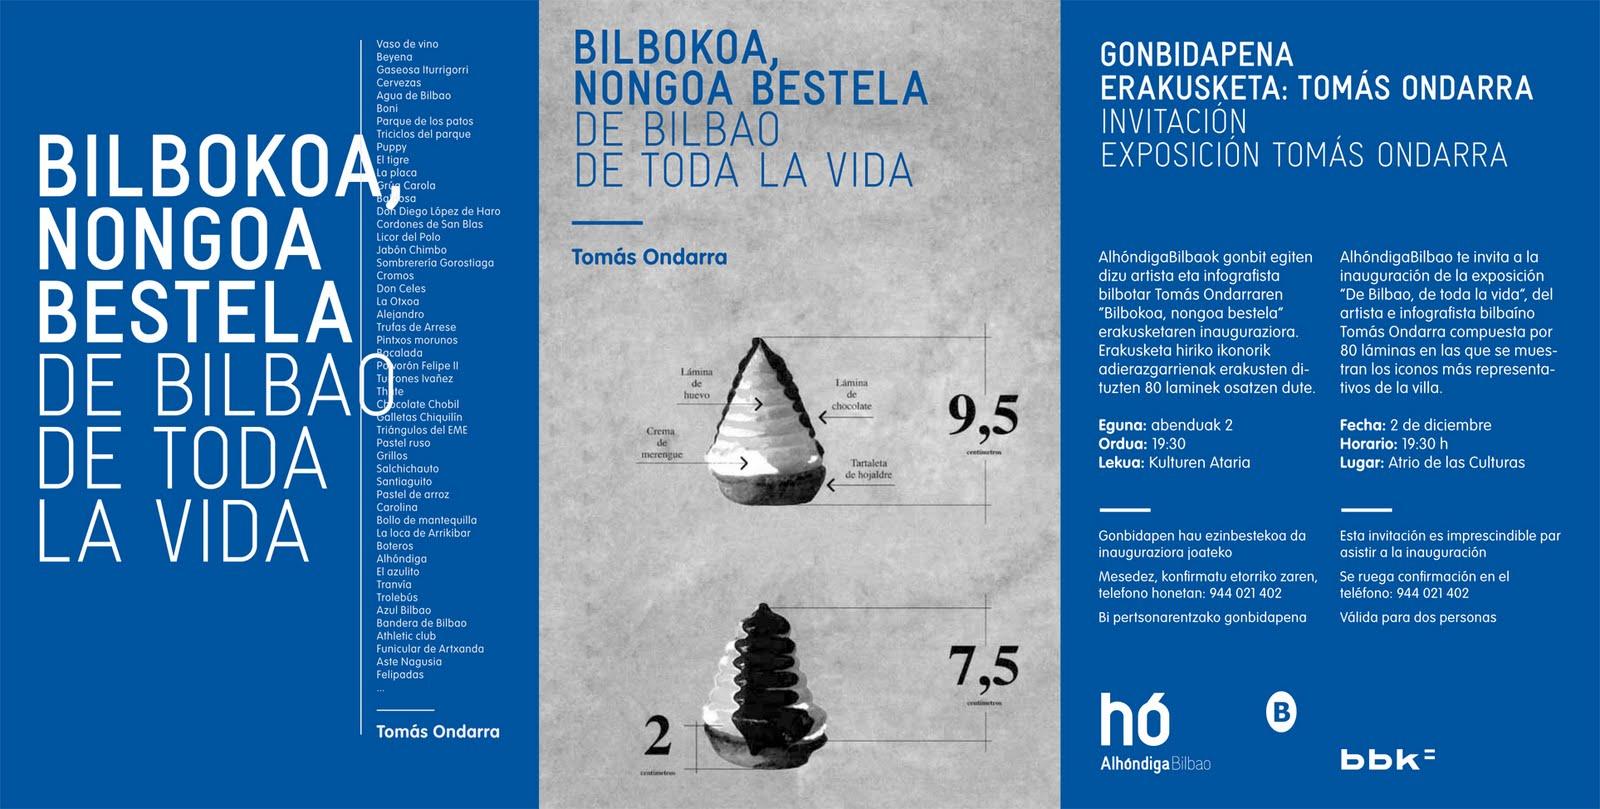 De Bilbao de toda la vida De Bilbao de toda la vida